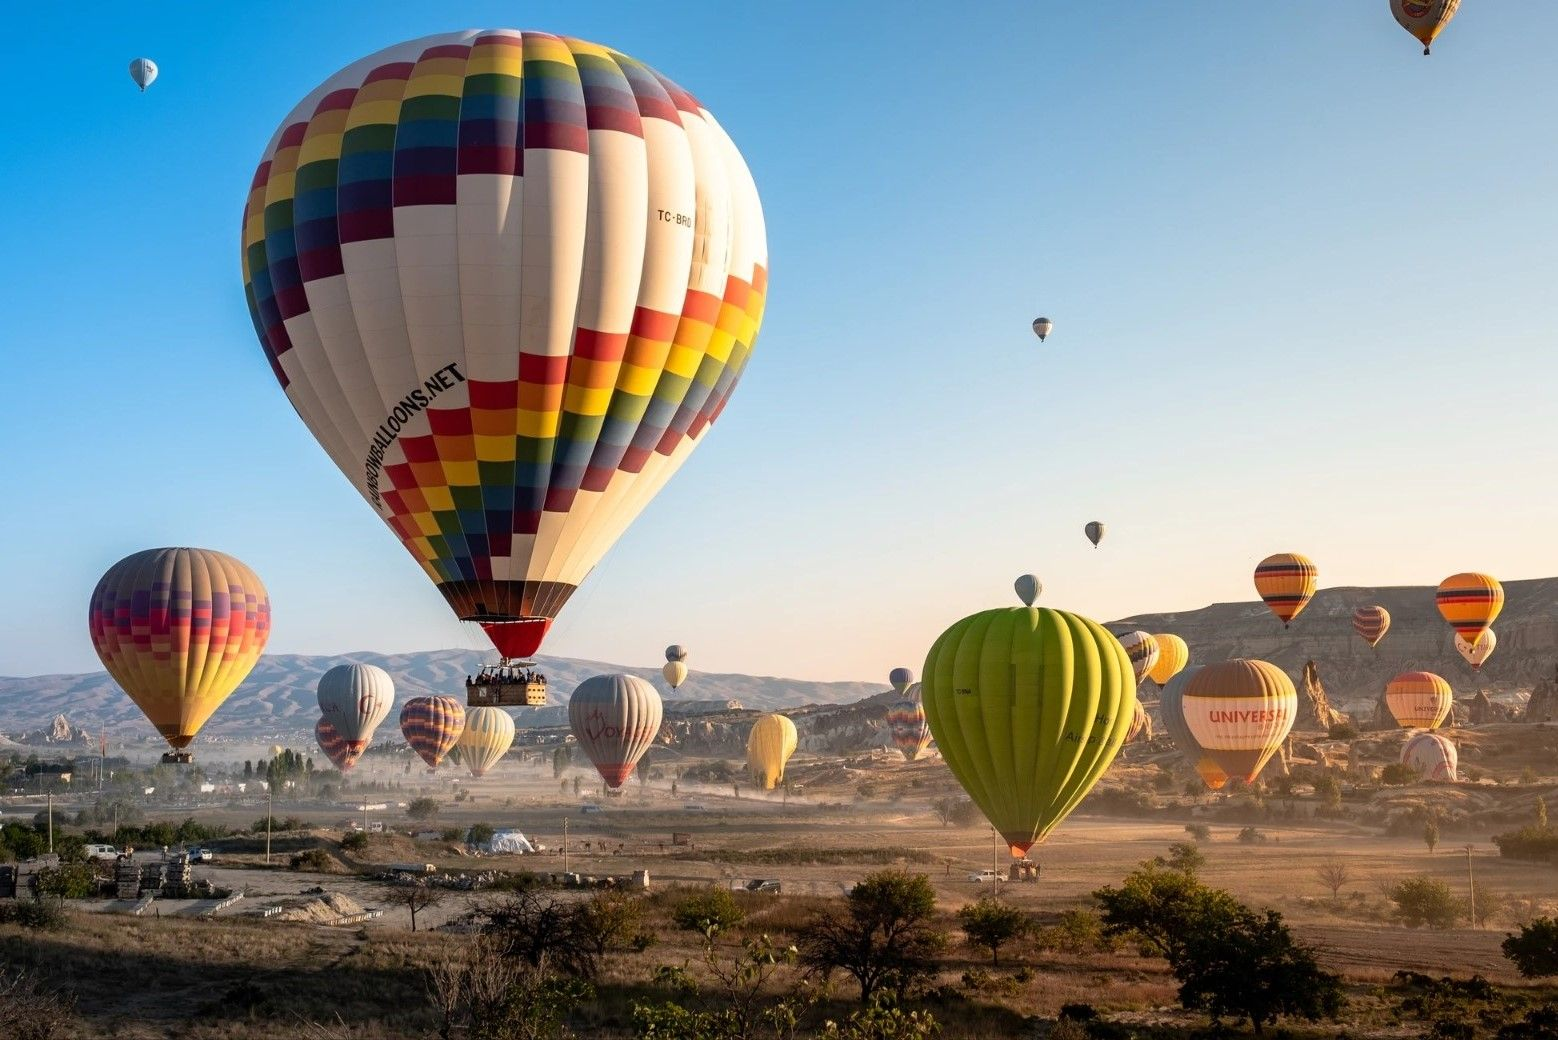 Balloons at Göreme, Nevşehir (Cappadocia), Turkey